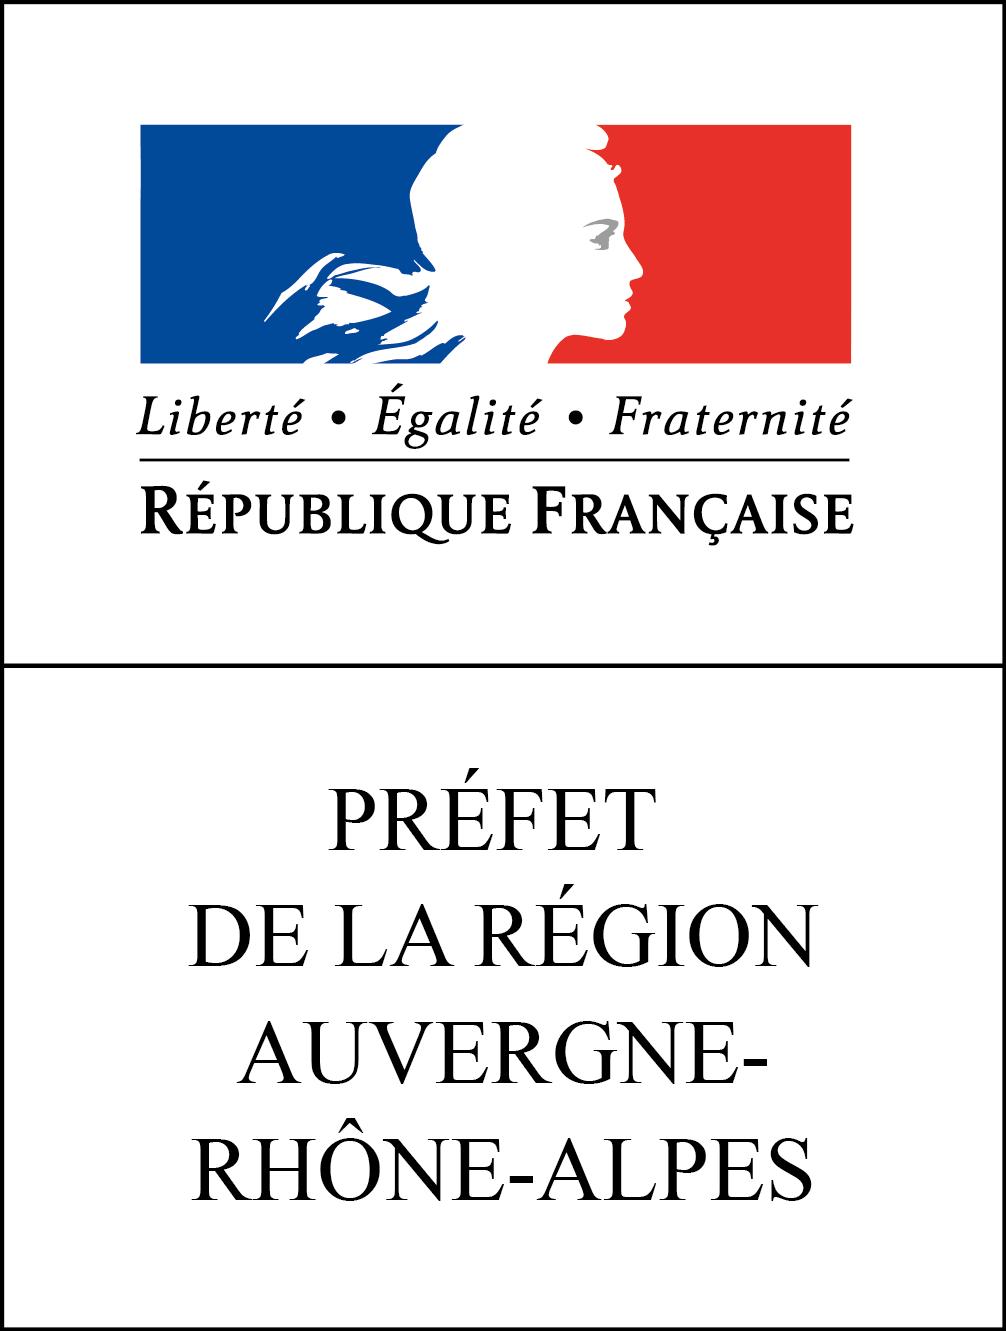 Préfet Région RA